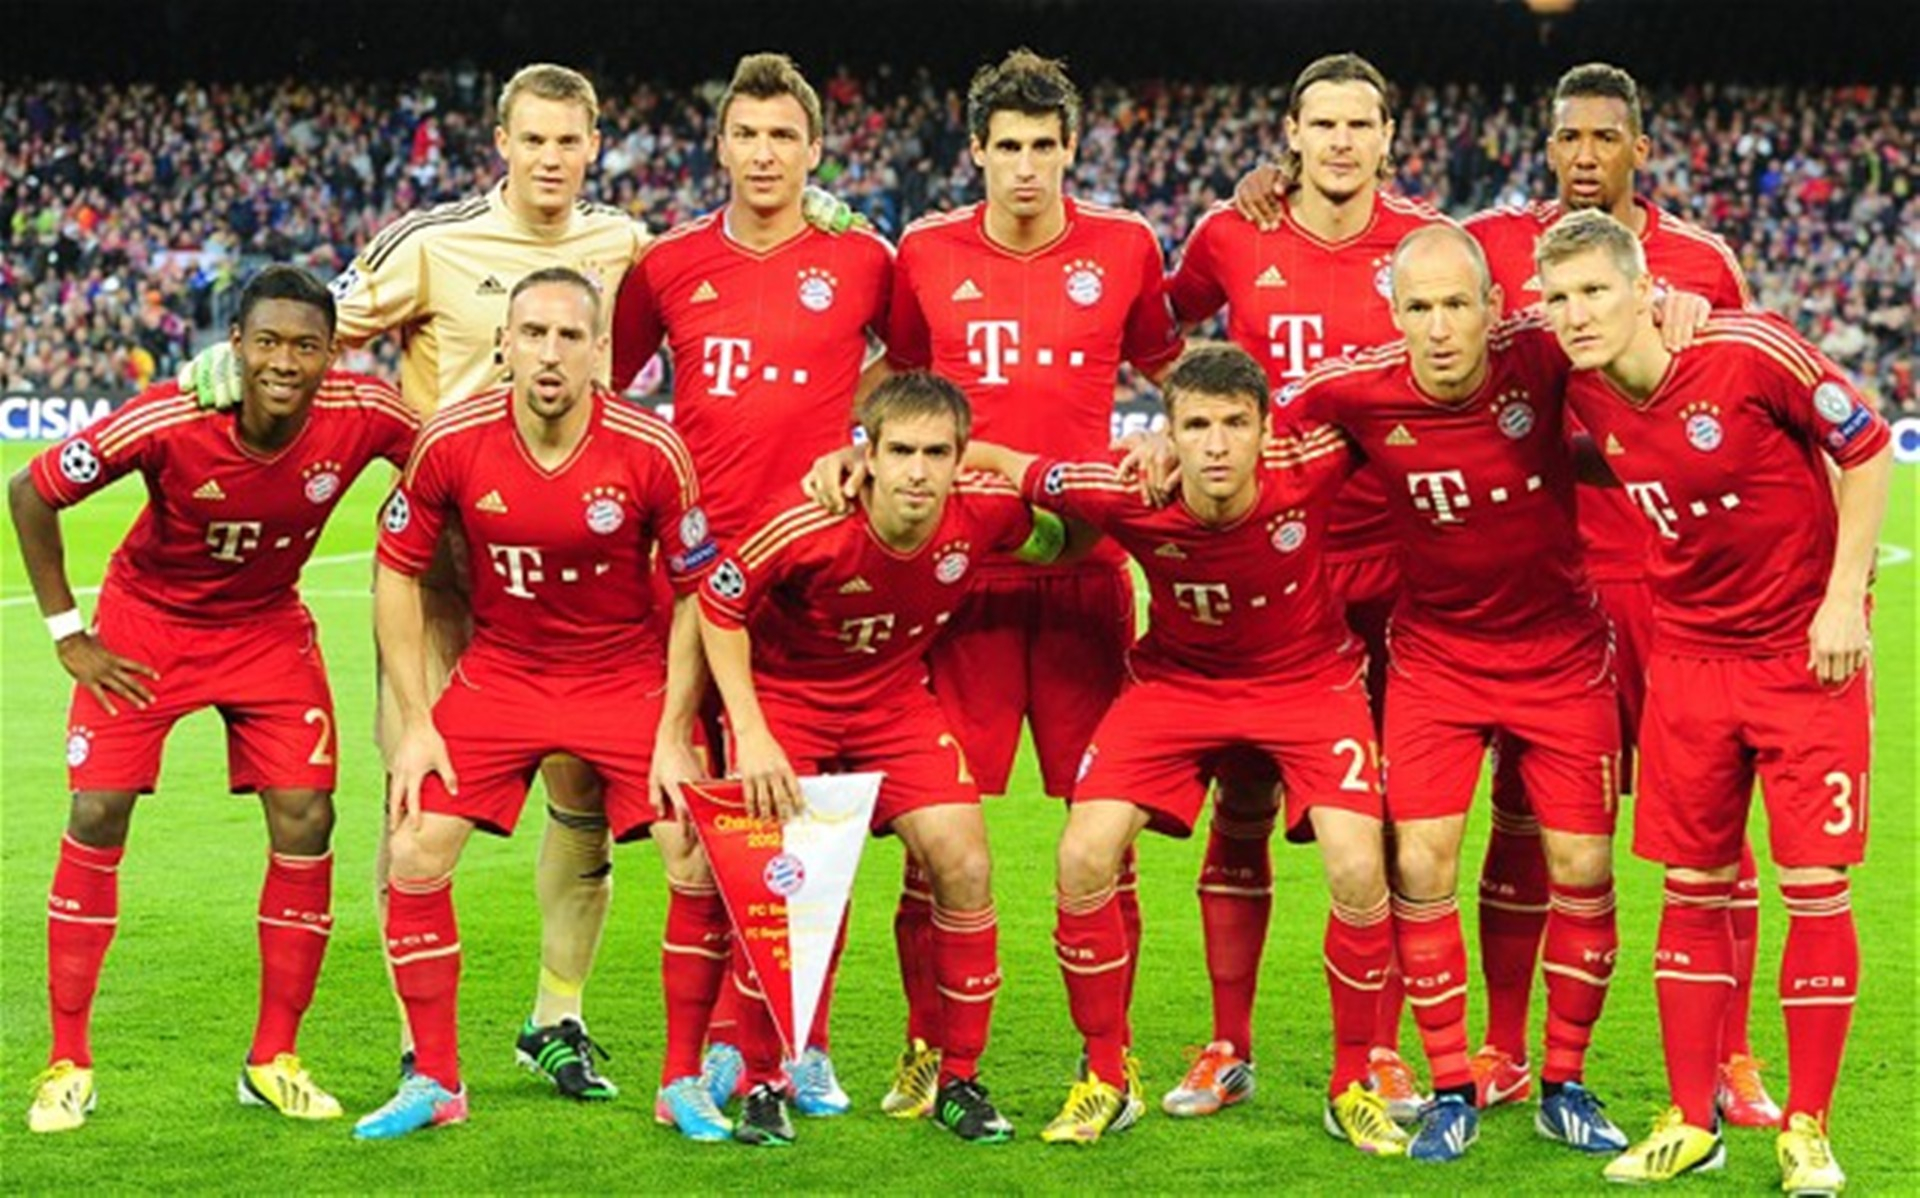 Bayern Munich 2014 Riposte Laque 1920x1198